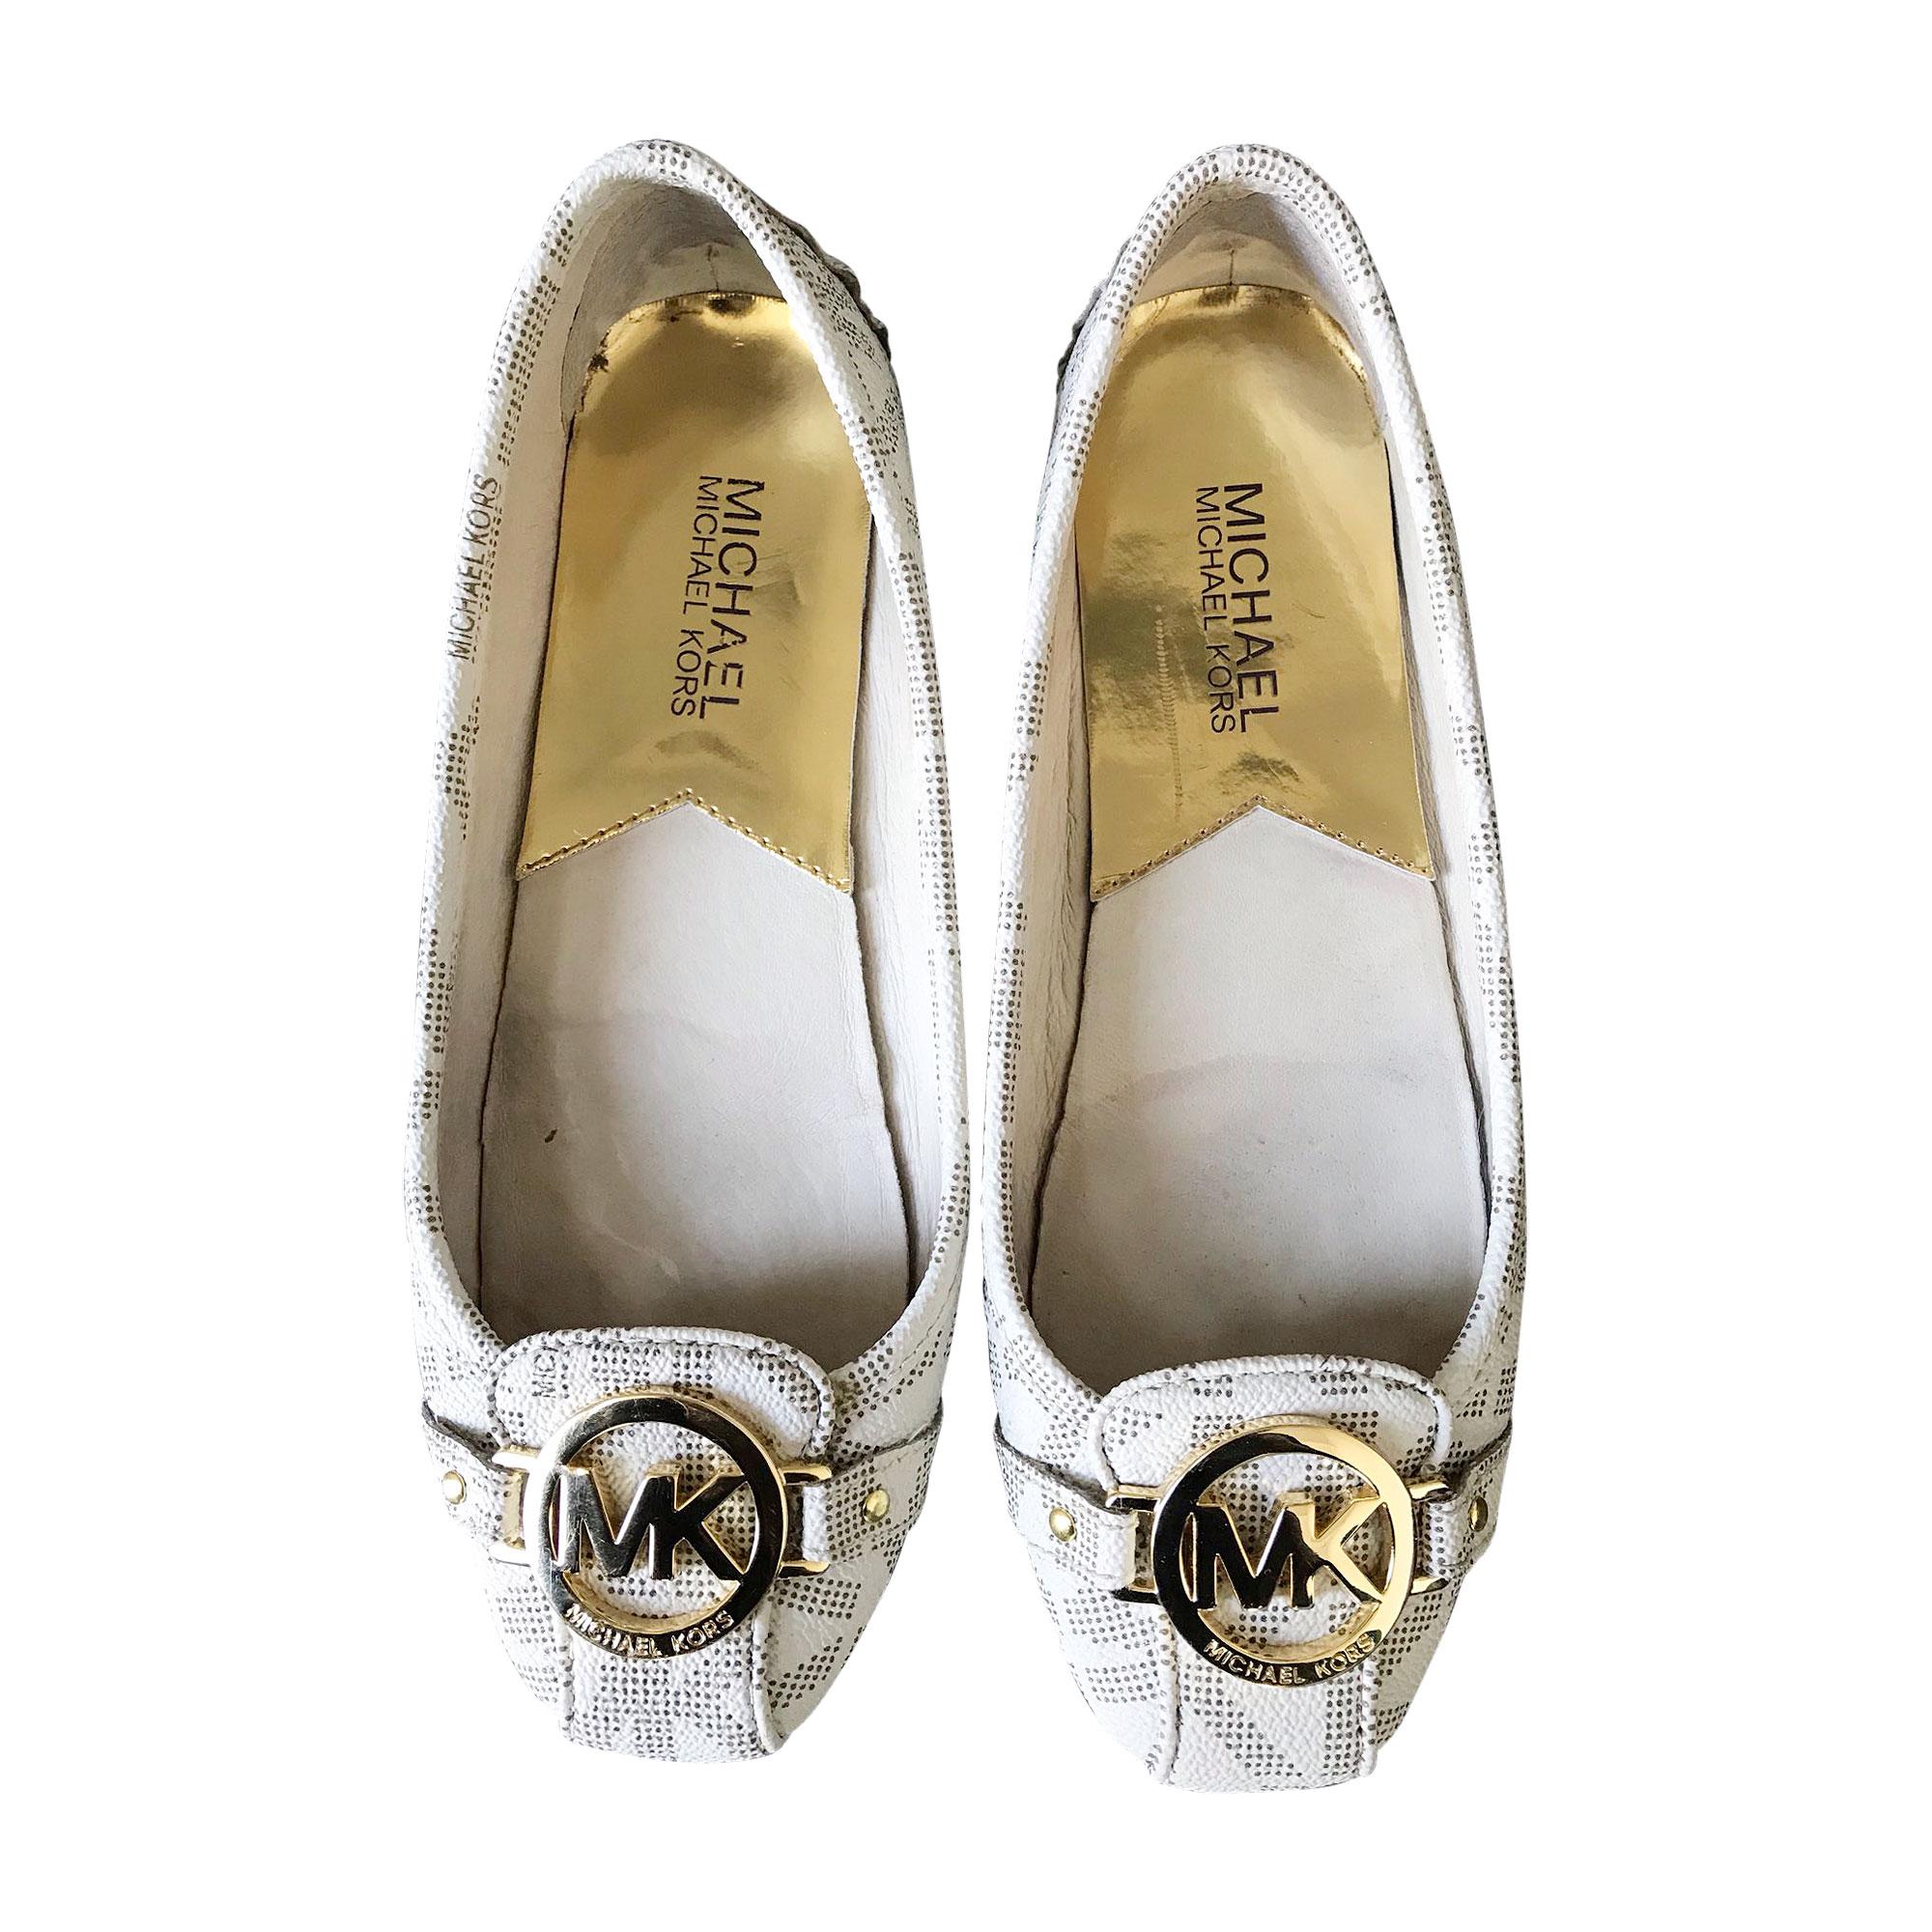 Loafers MICHAEL KORS White, off-white, ecru